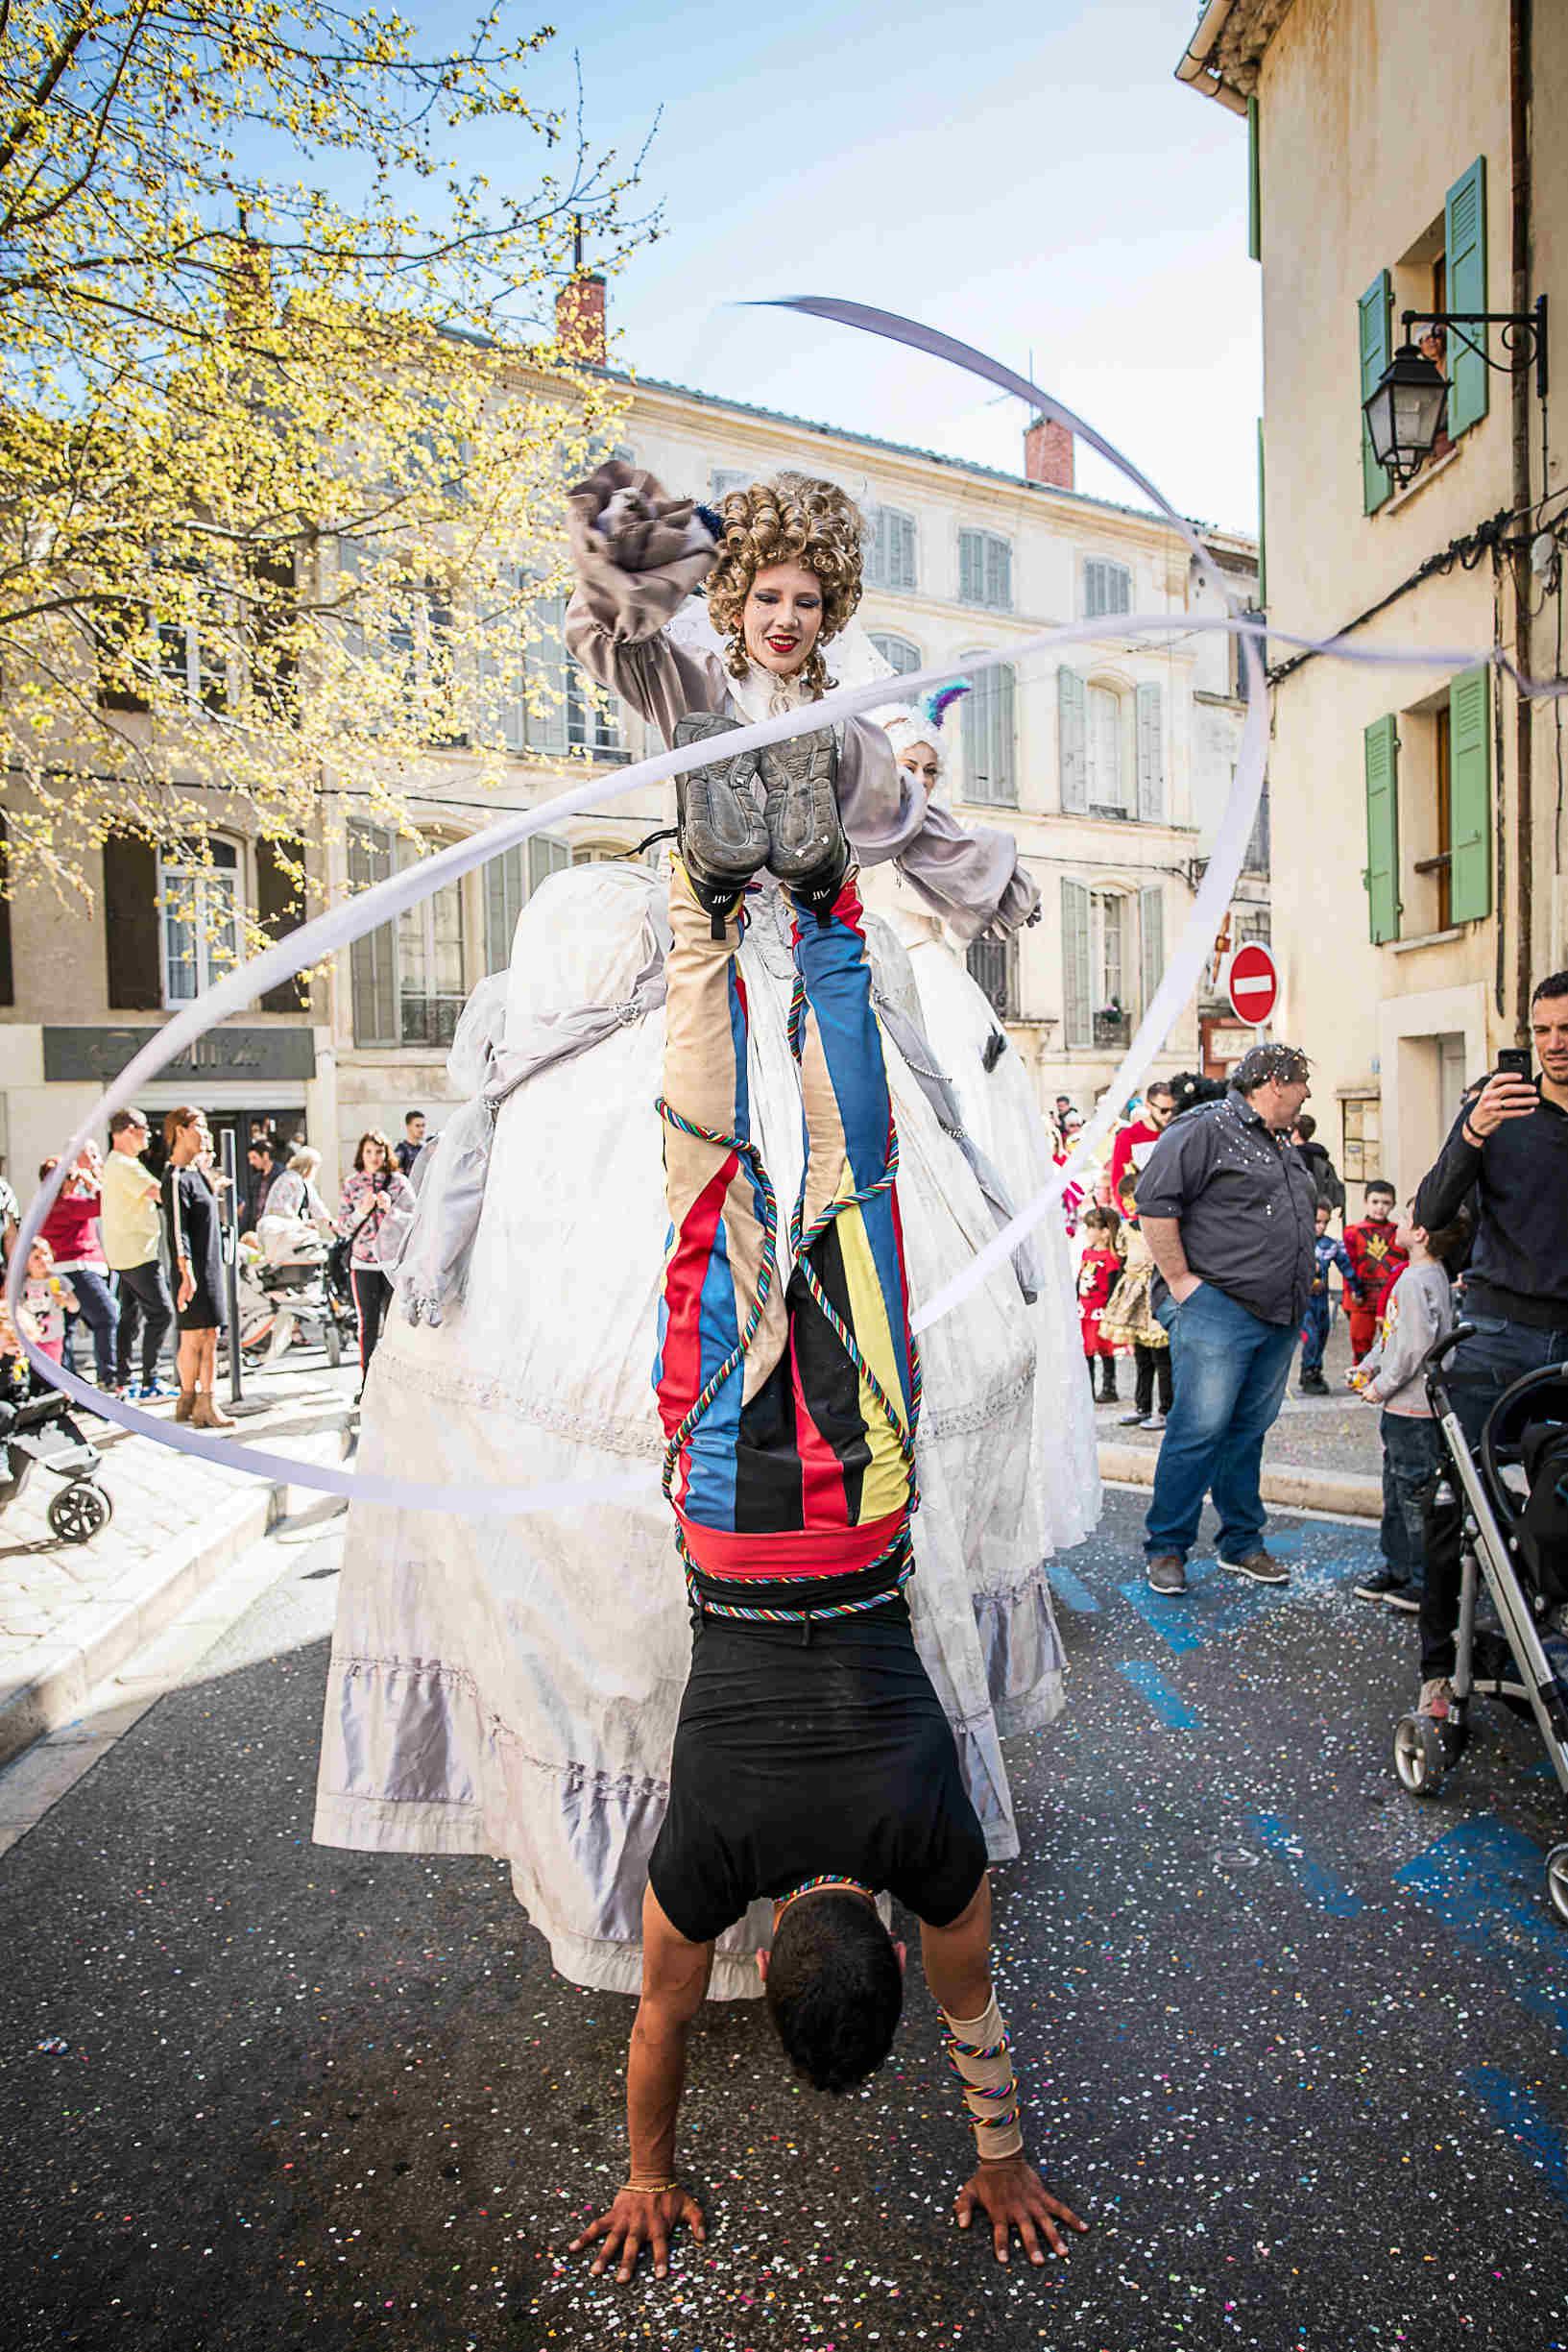 parade carnaval acrobate cirque indigo